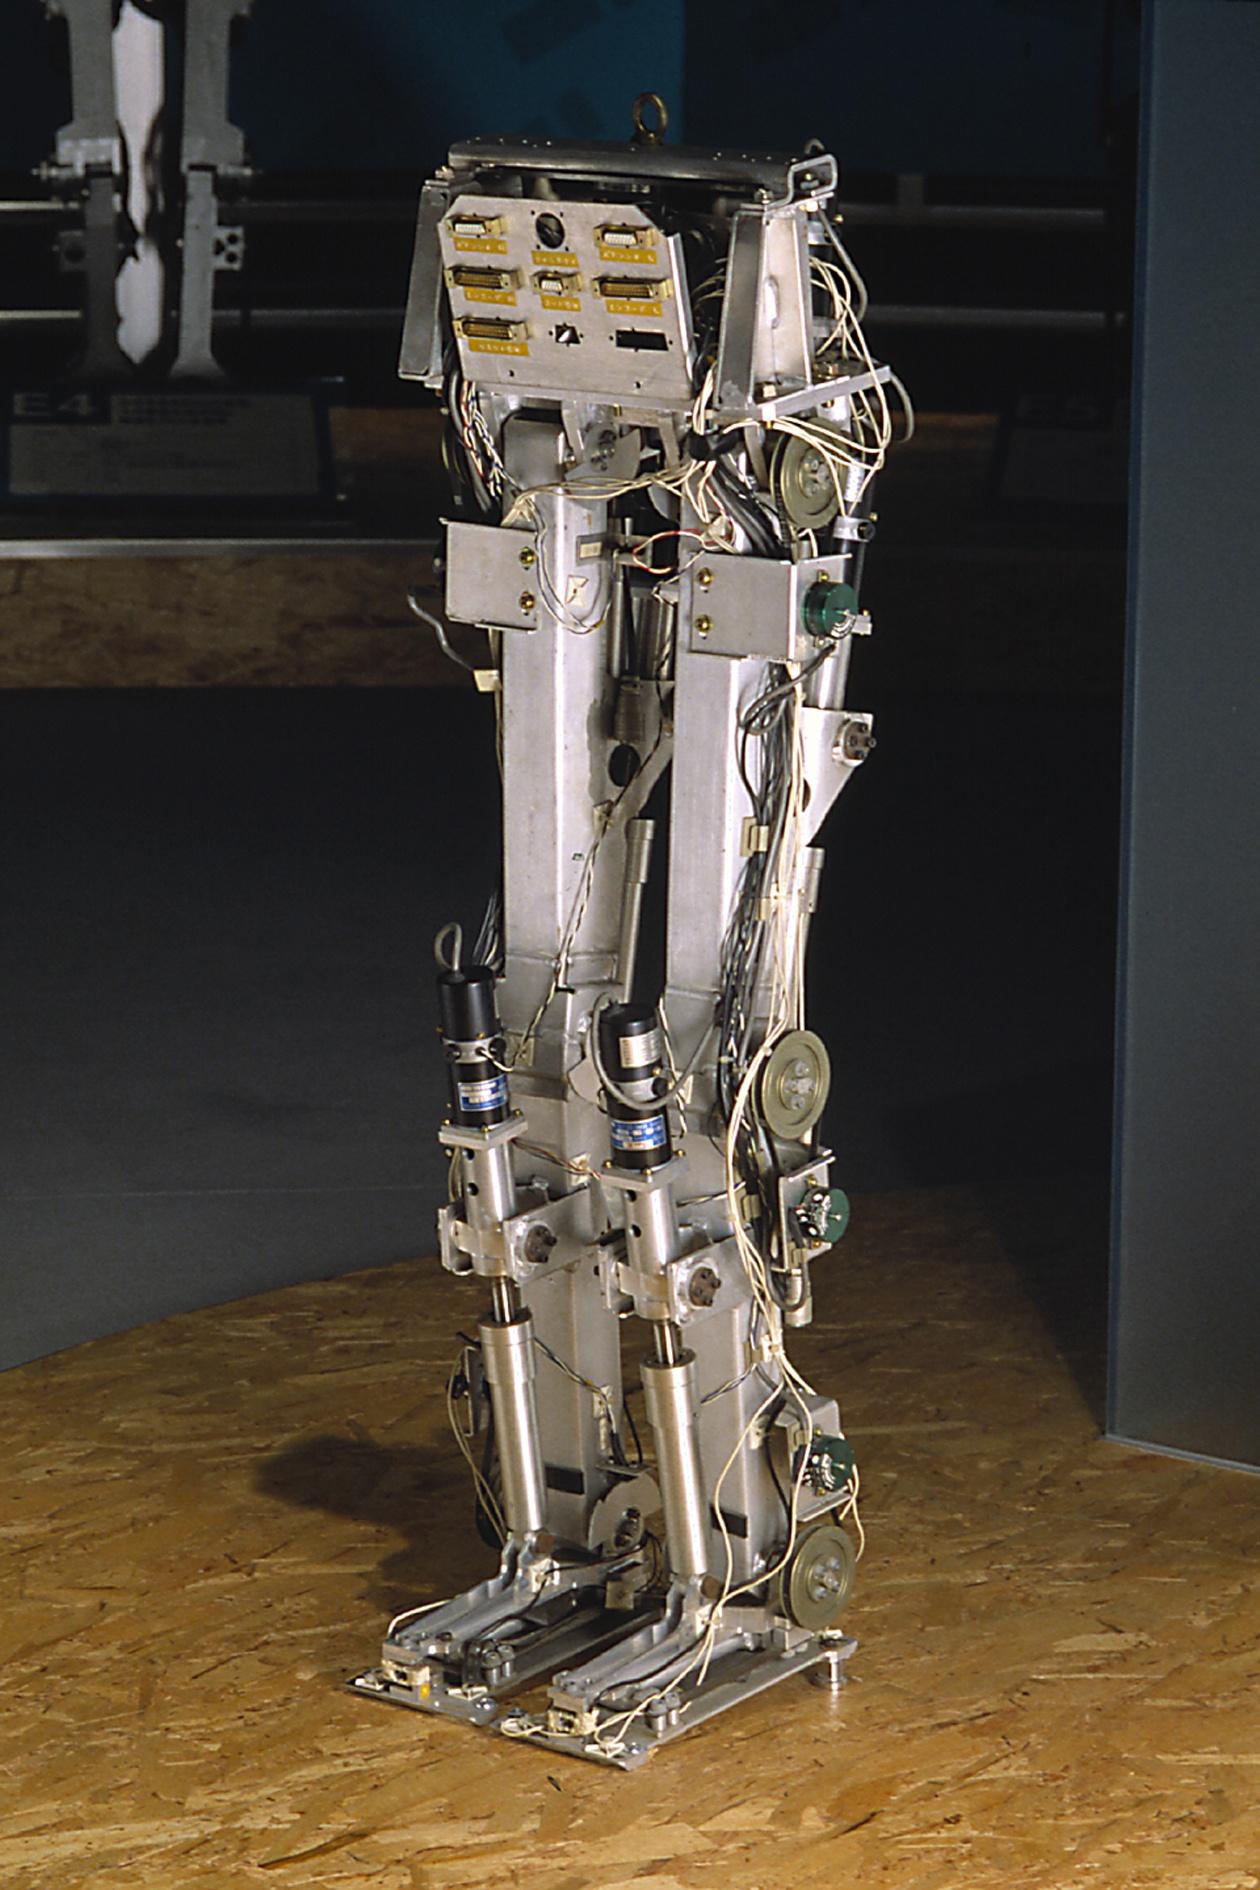 Amazing Robots!